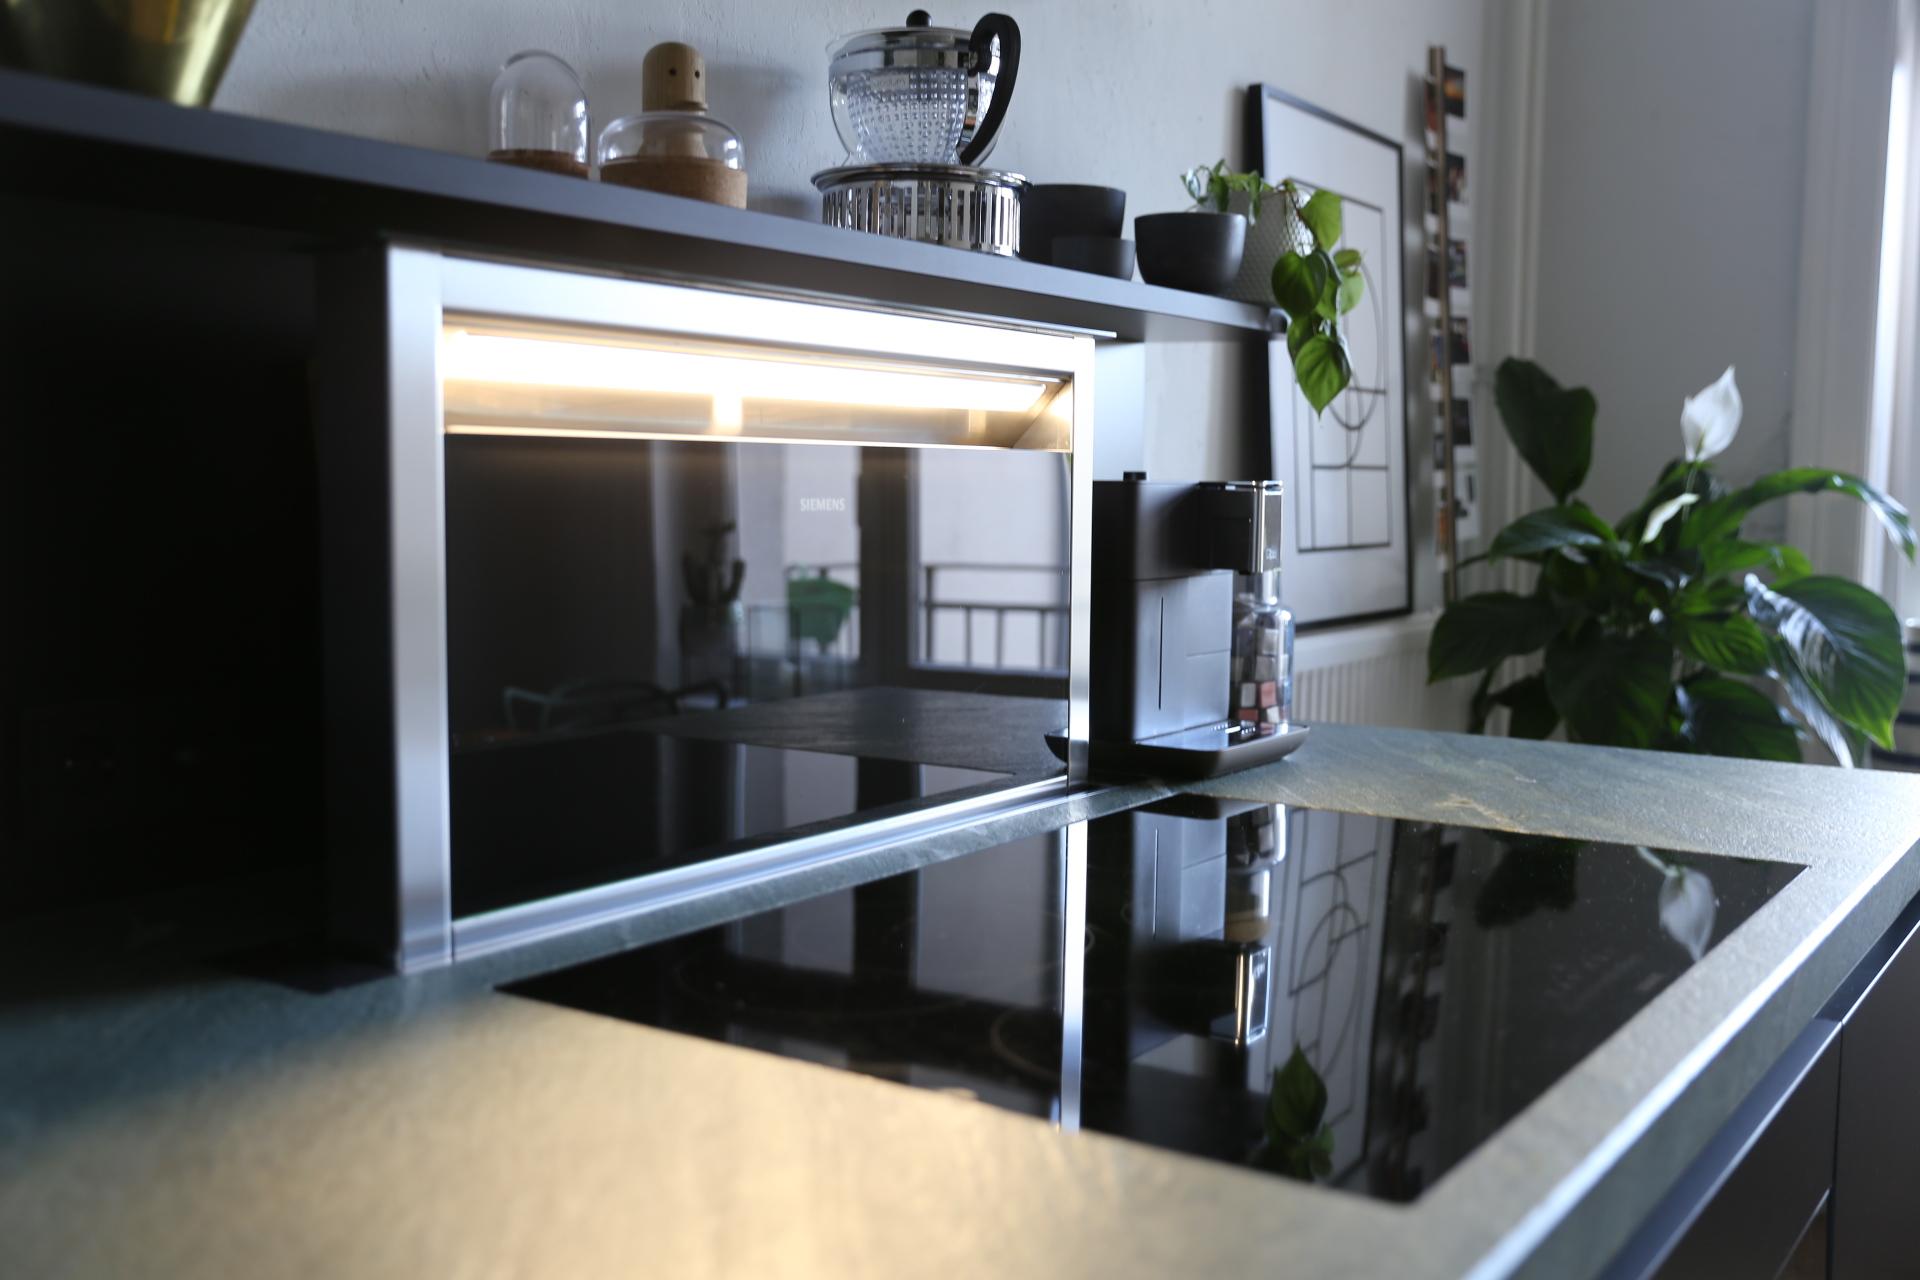 Tischlüftung Küche Dunstabzug